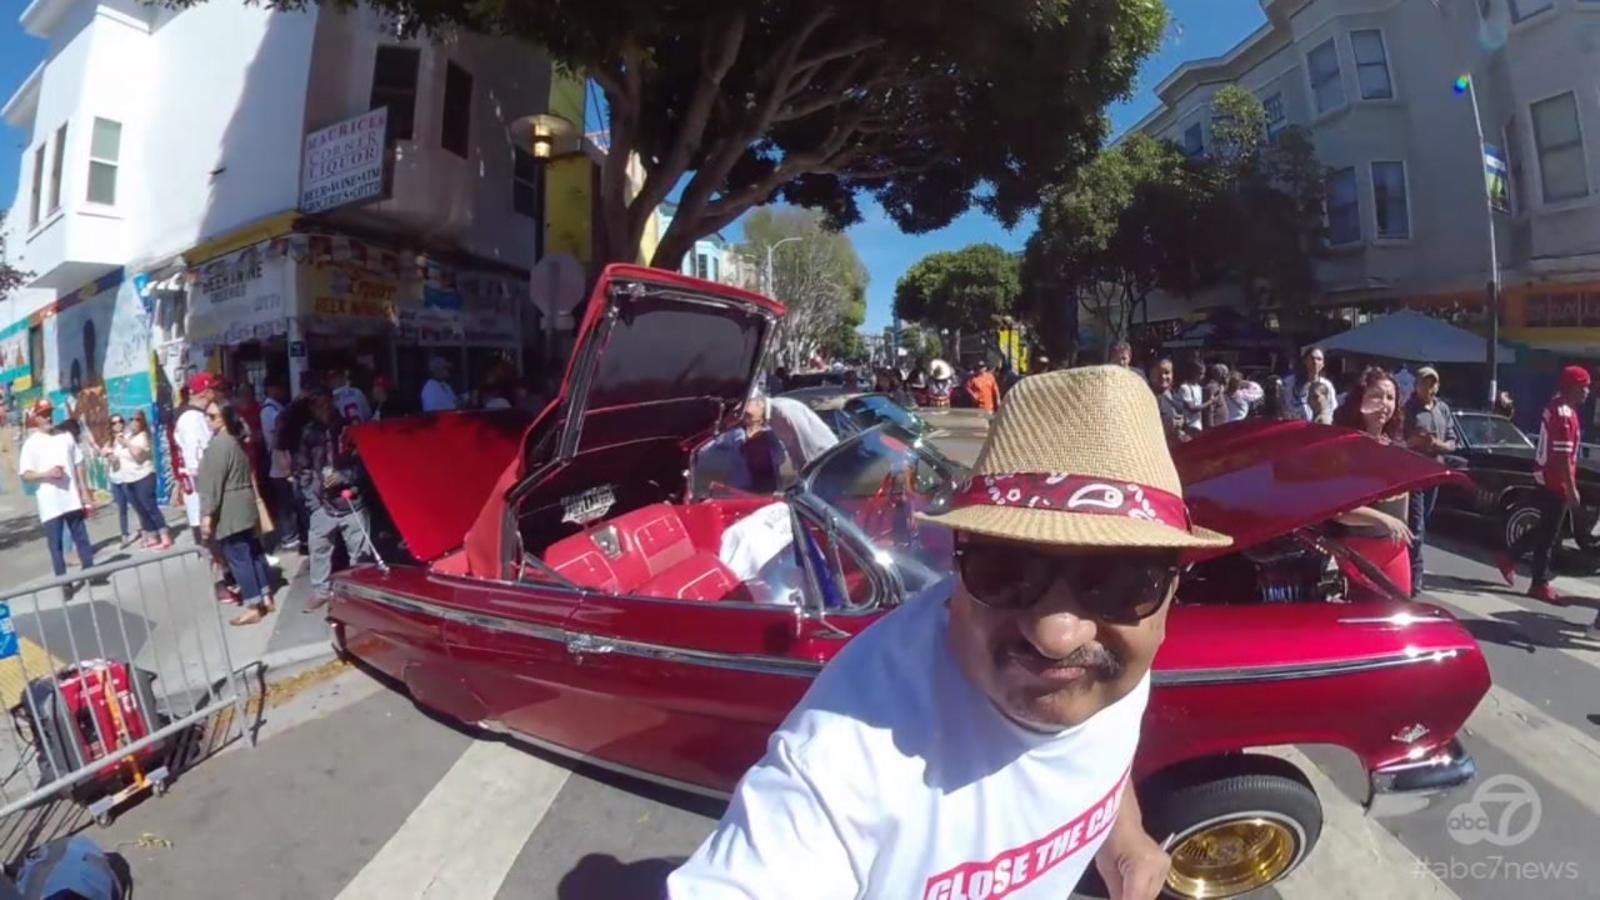 The Lowdown on Lowriders at Fiesta de las Americas Car Show